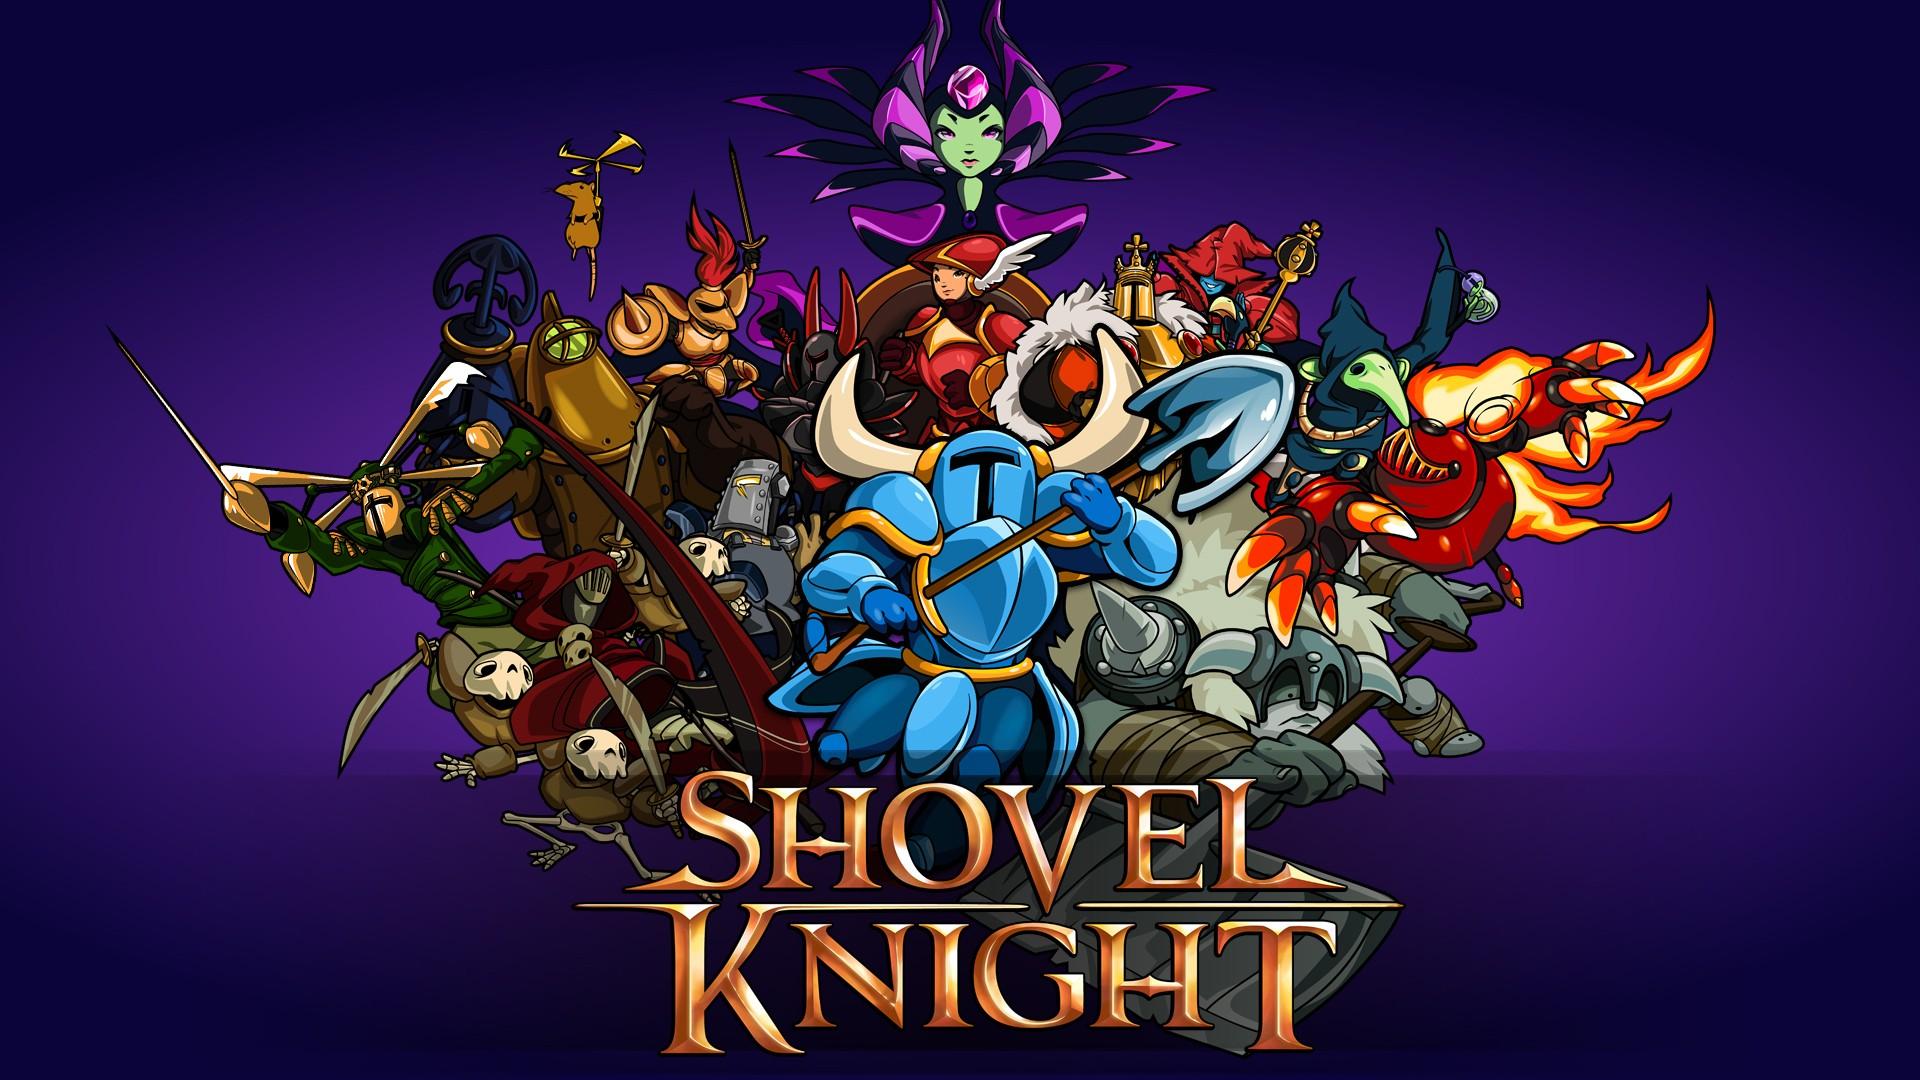 Shovel Knight Wallpaper ① Download Free Cool High Resolution